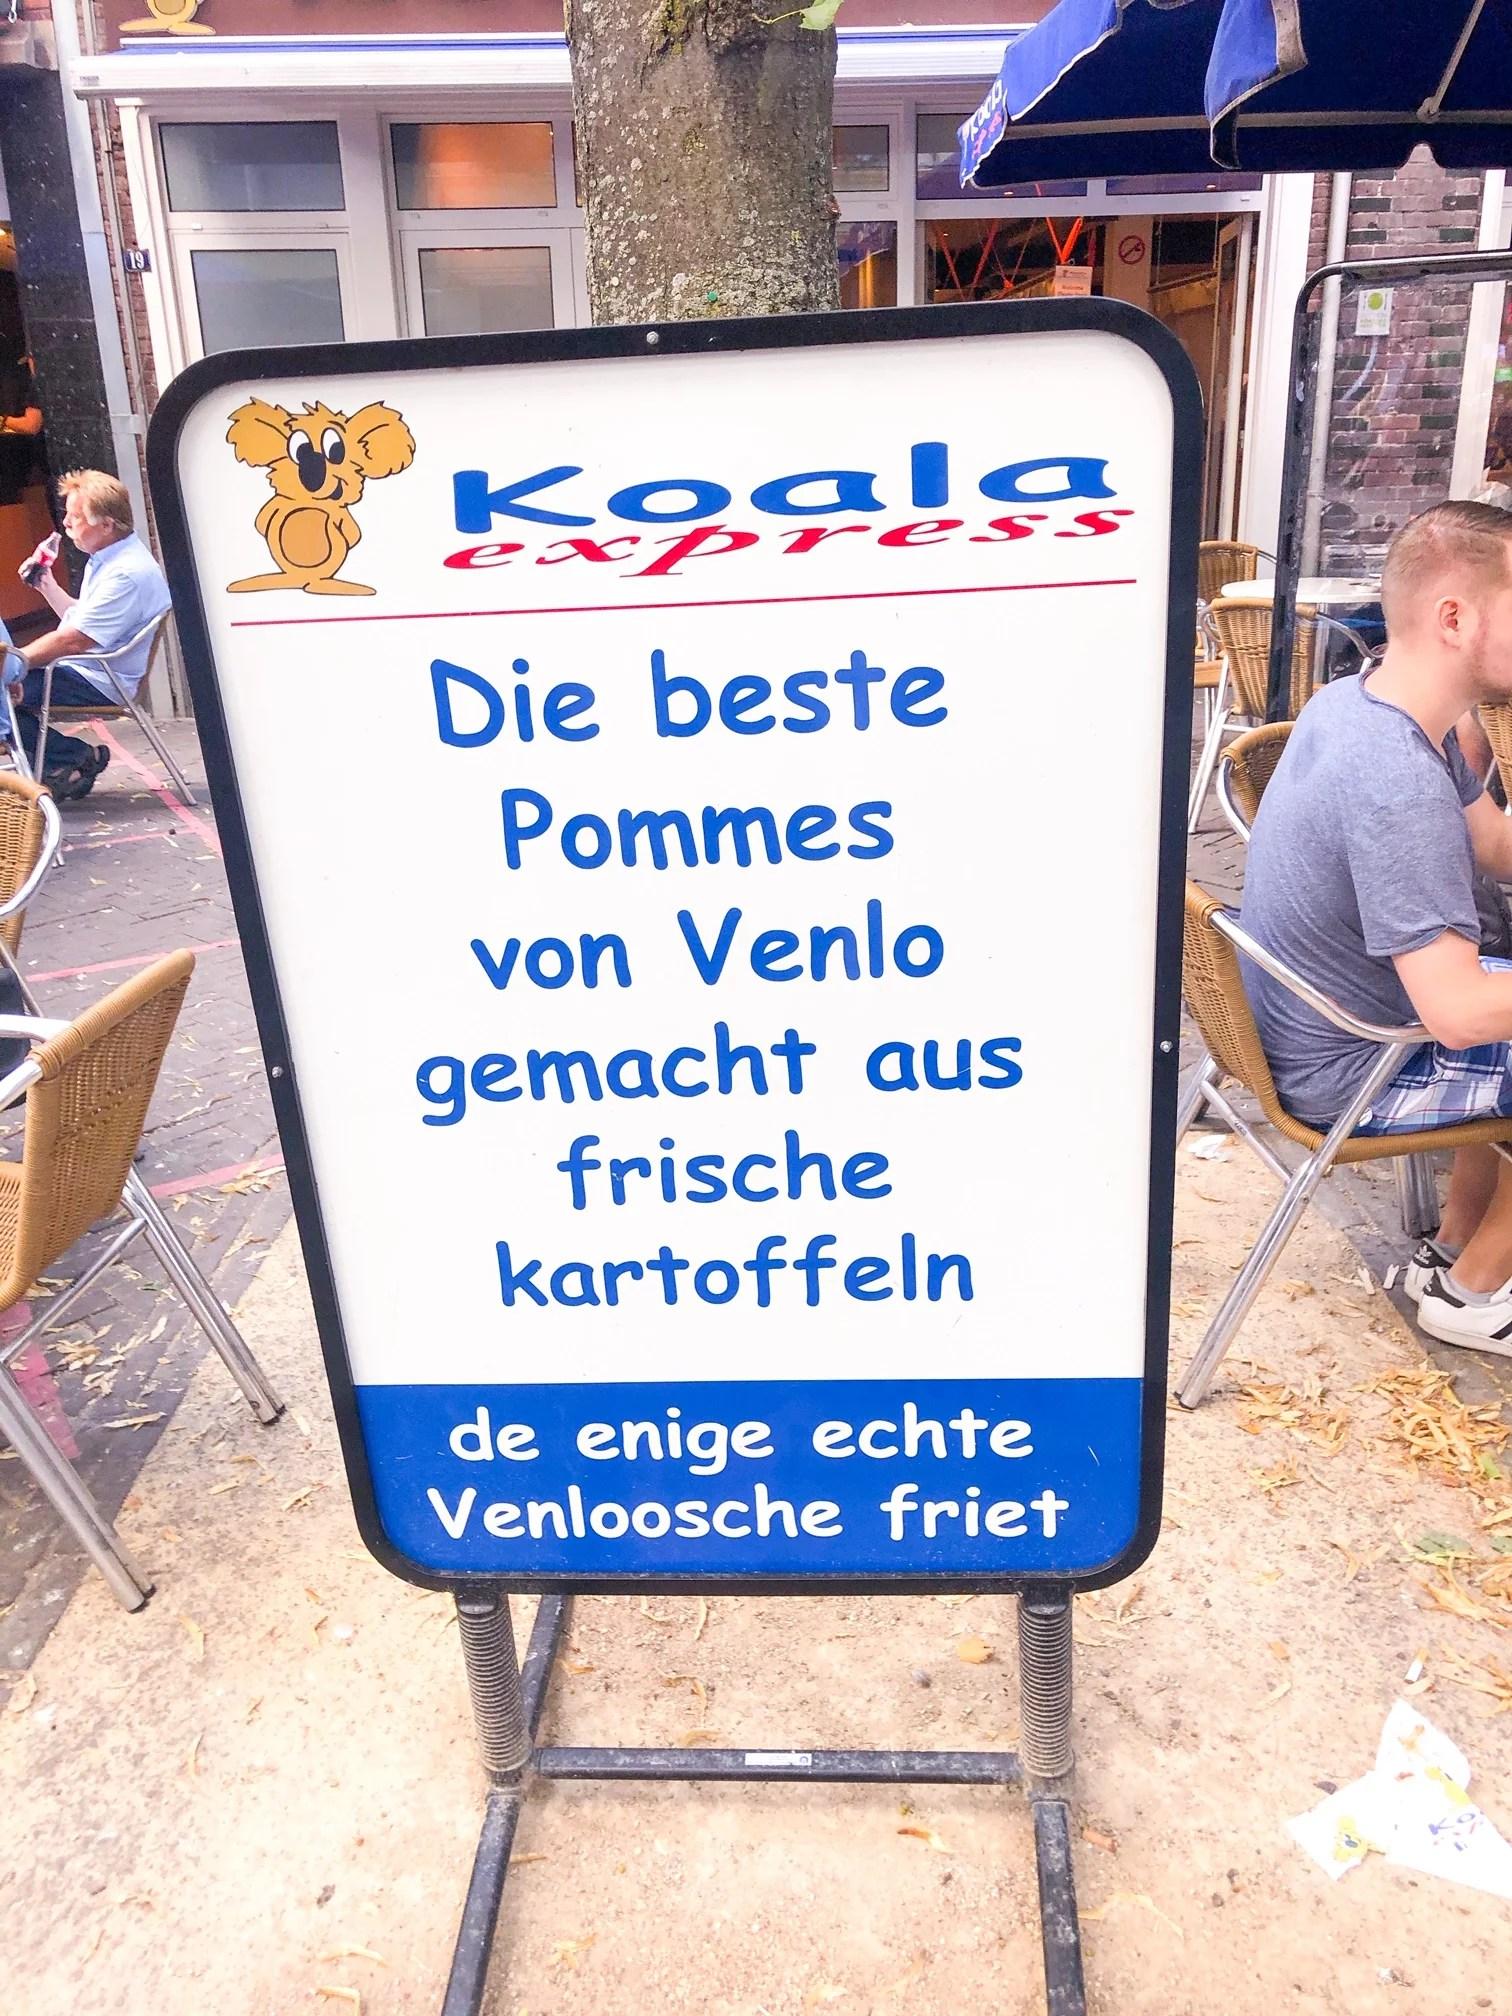 Pommes essen in Venlo